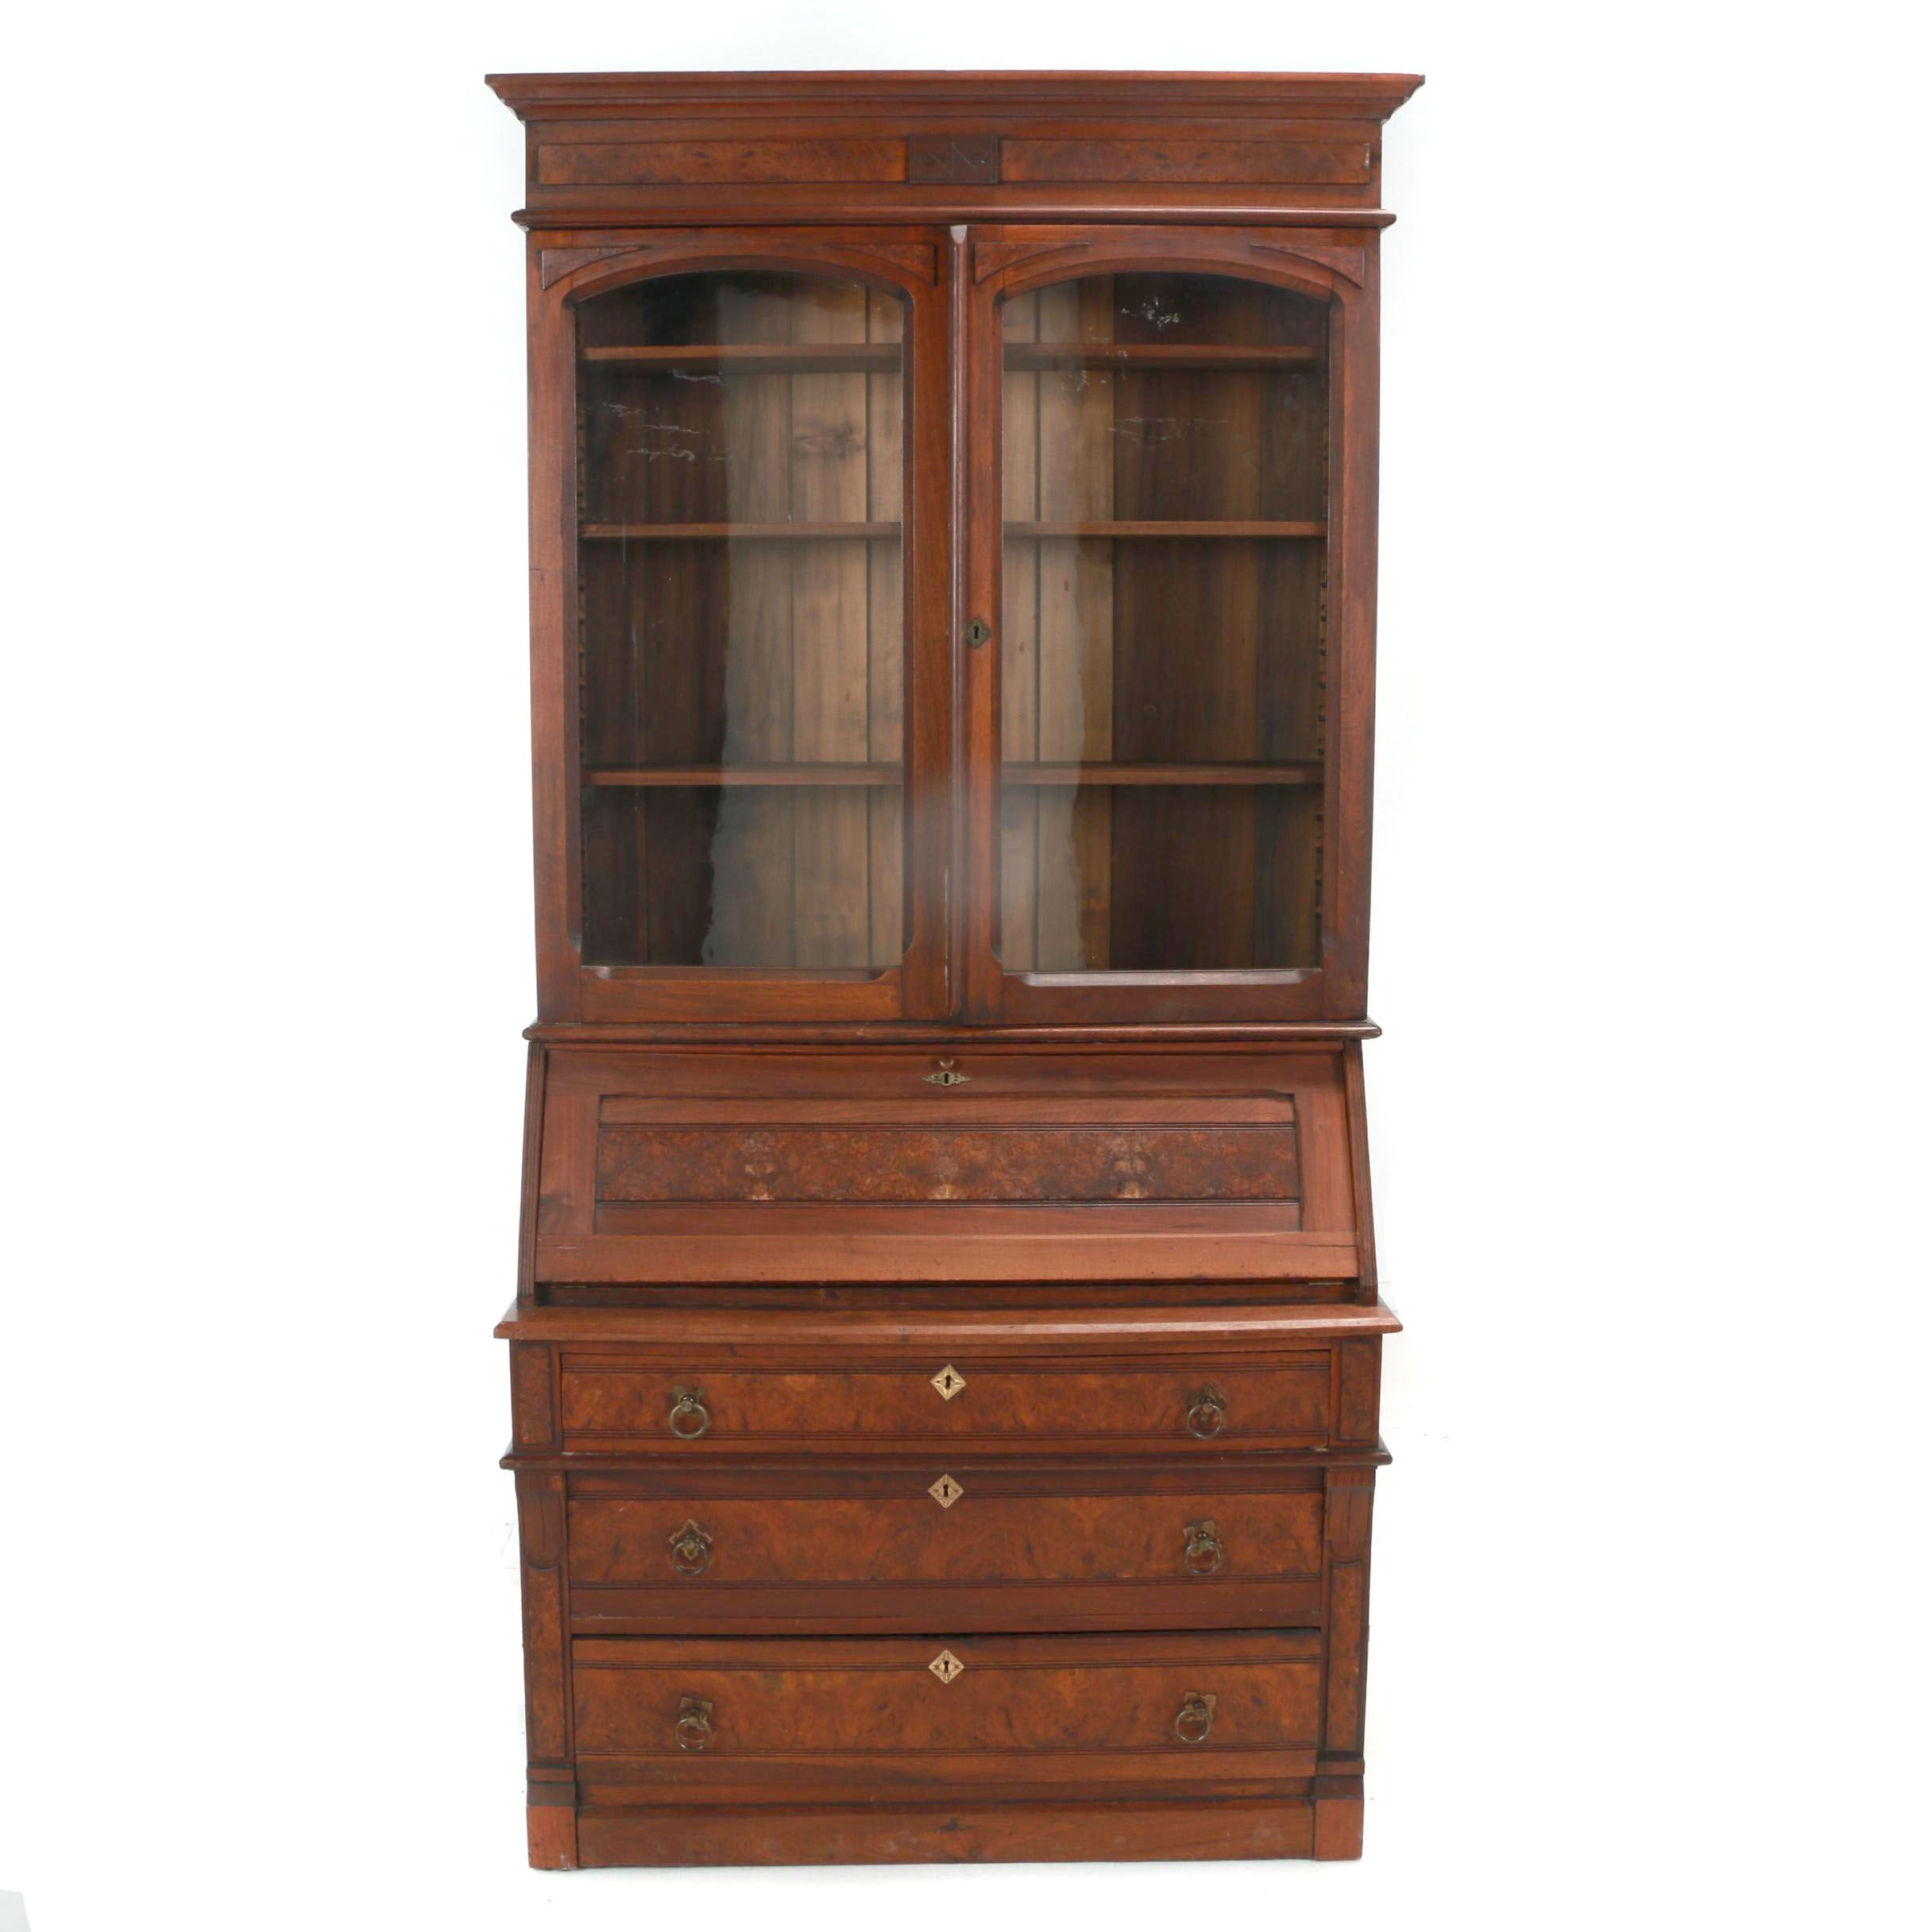 Victorian Walnut and Burl Walnut Secretary Bookcase, Late 19th Century